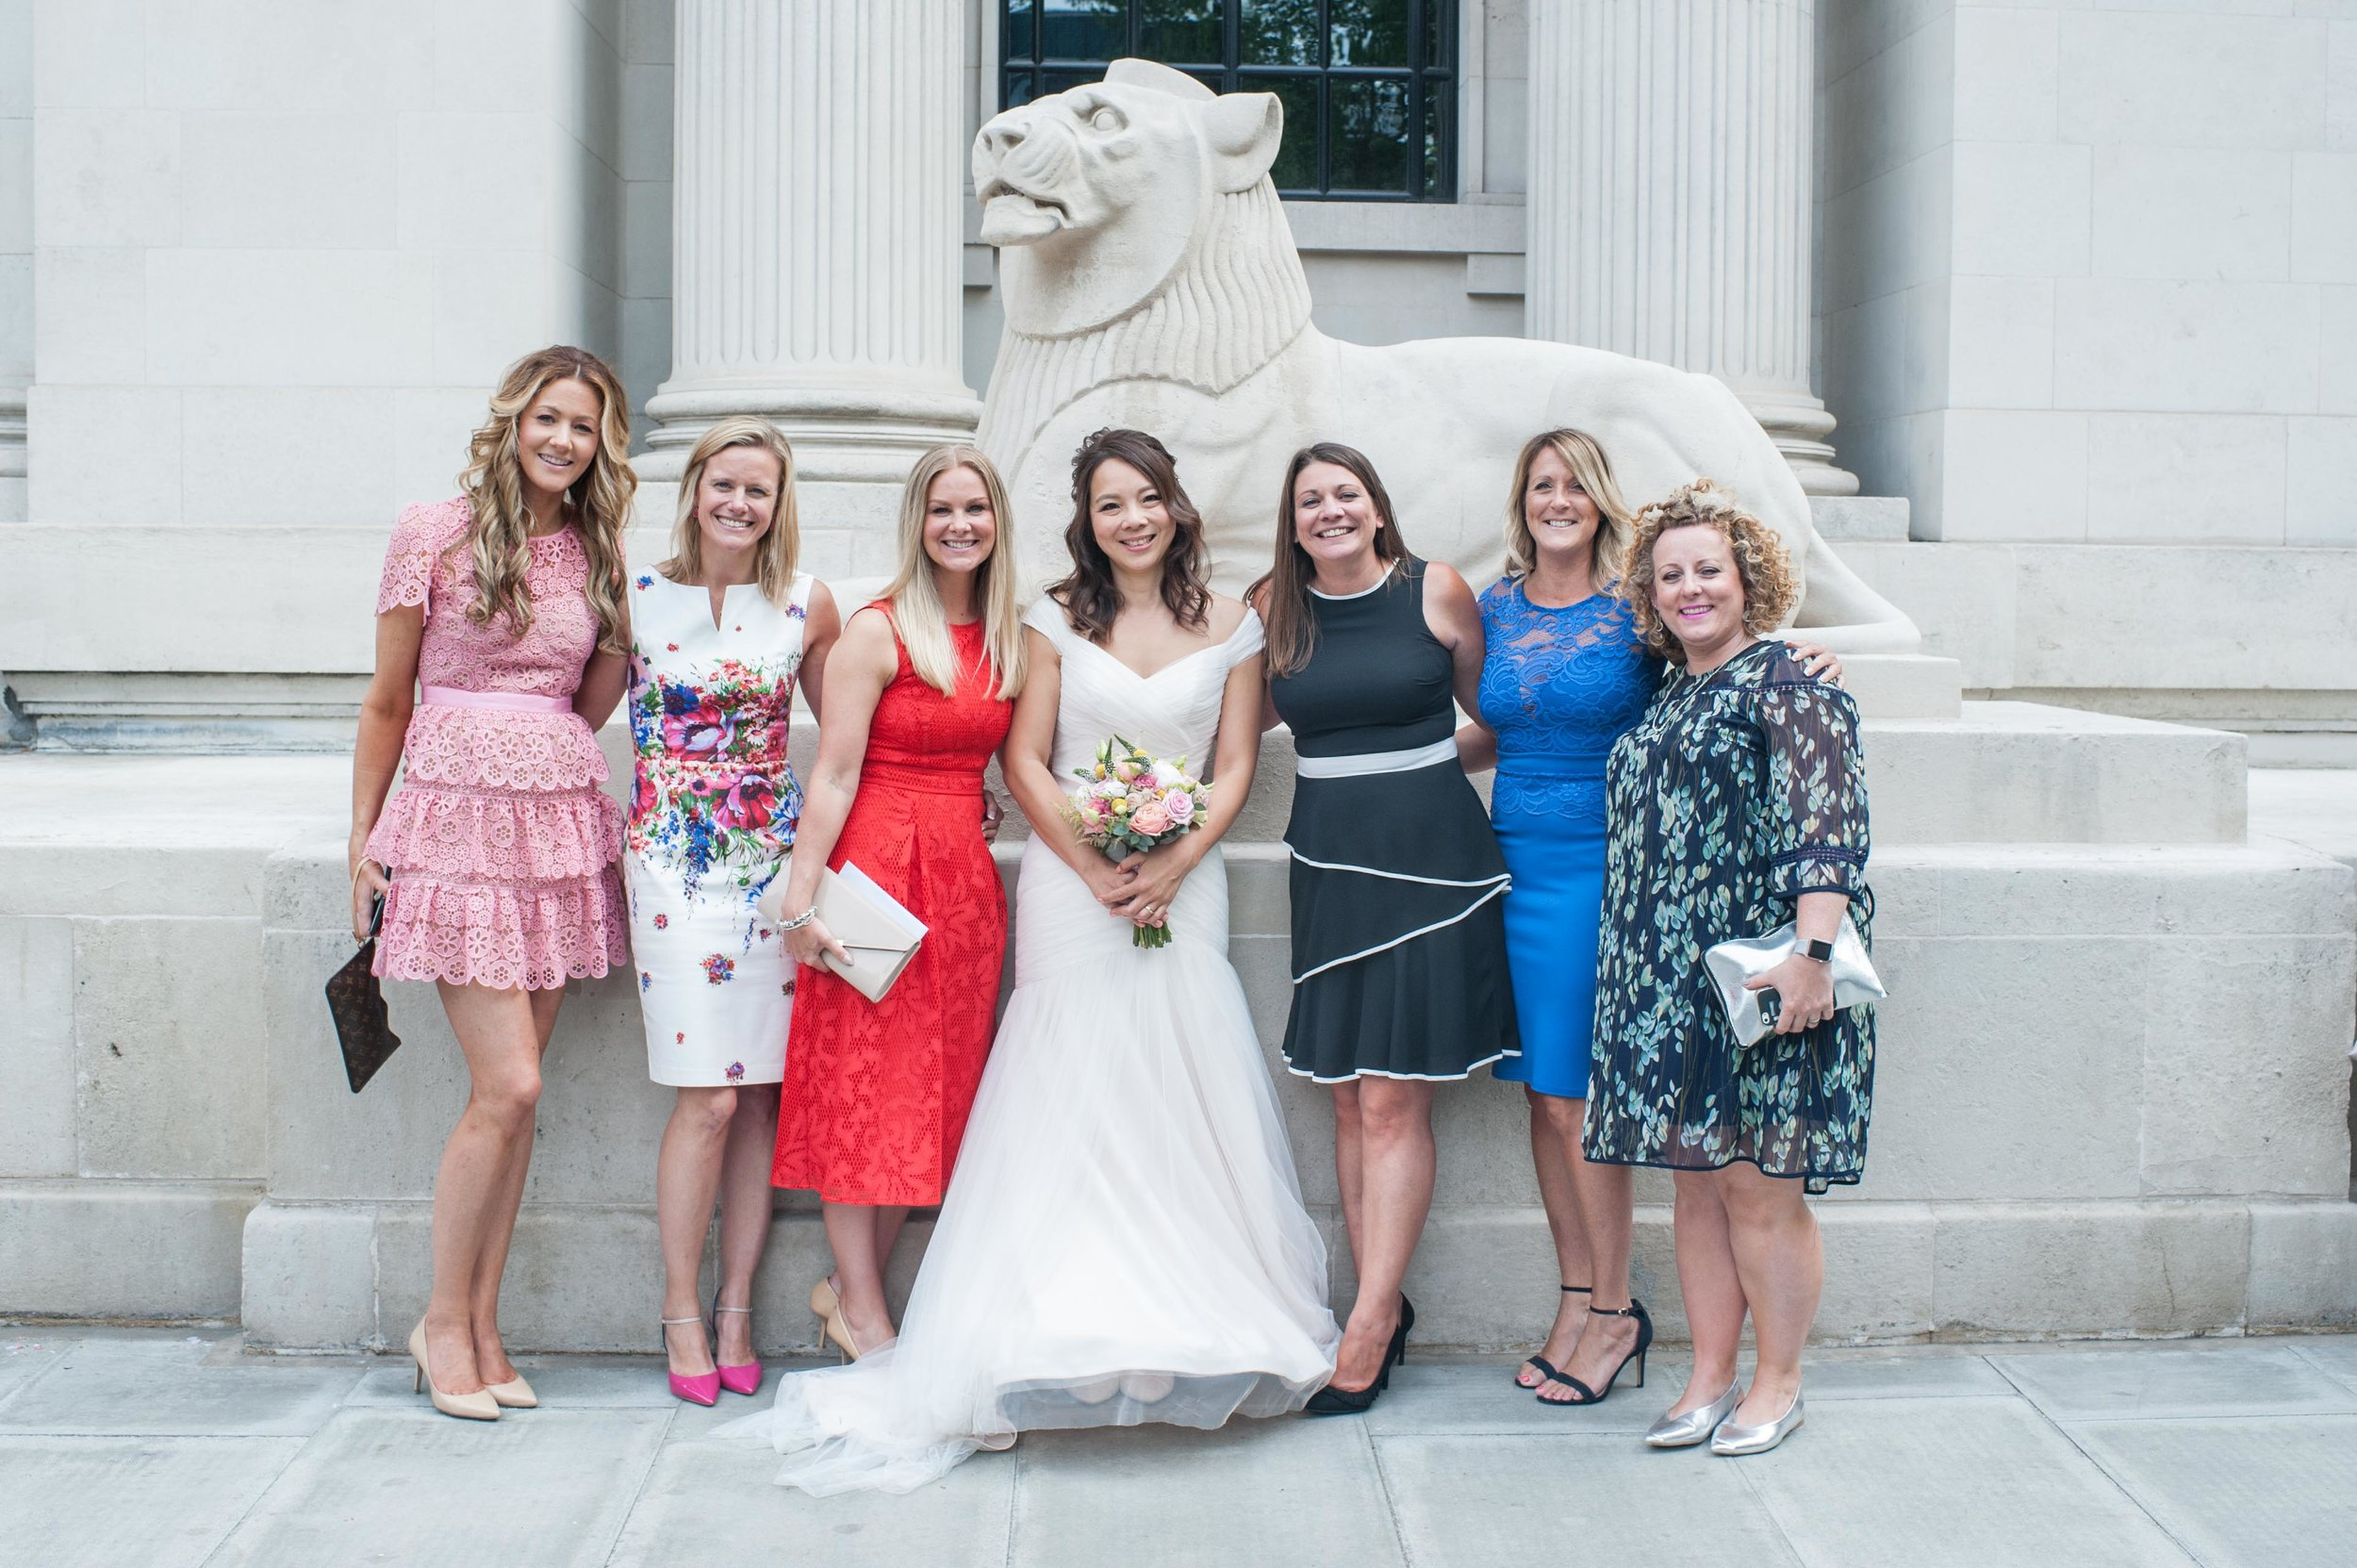 D&M_Marylebone Town Hall Wedding (152 of 239).jpg